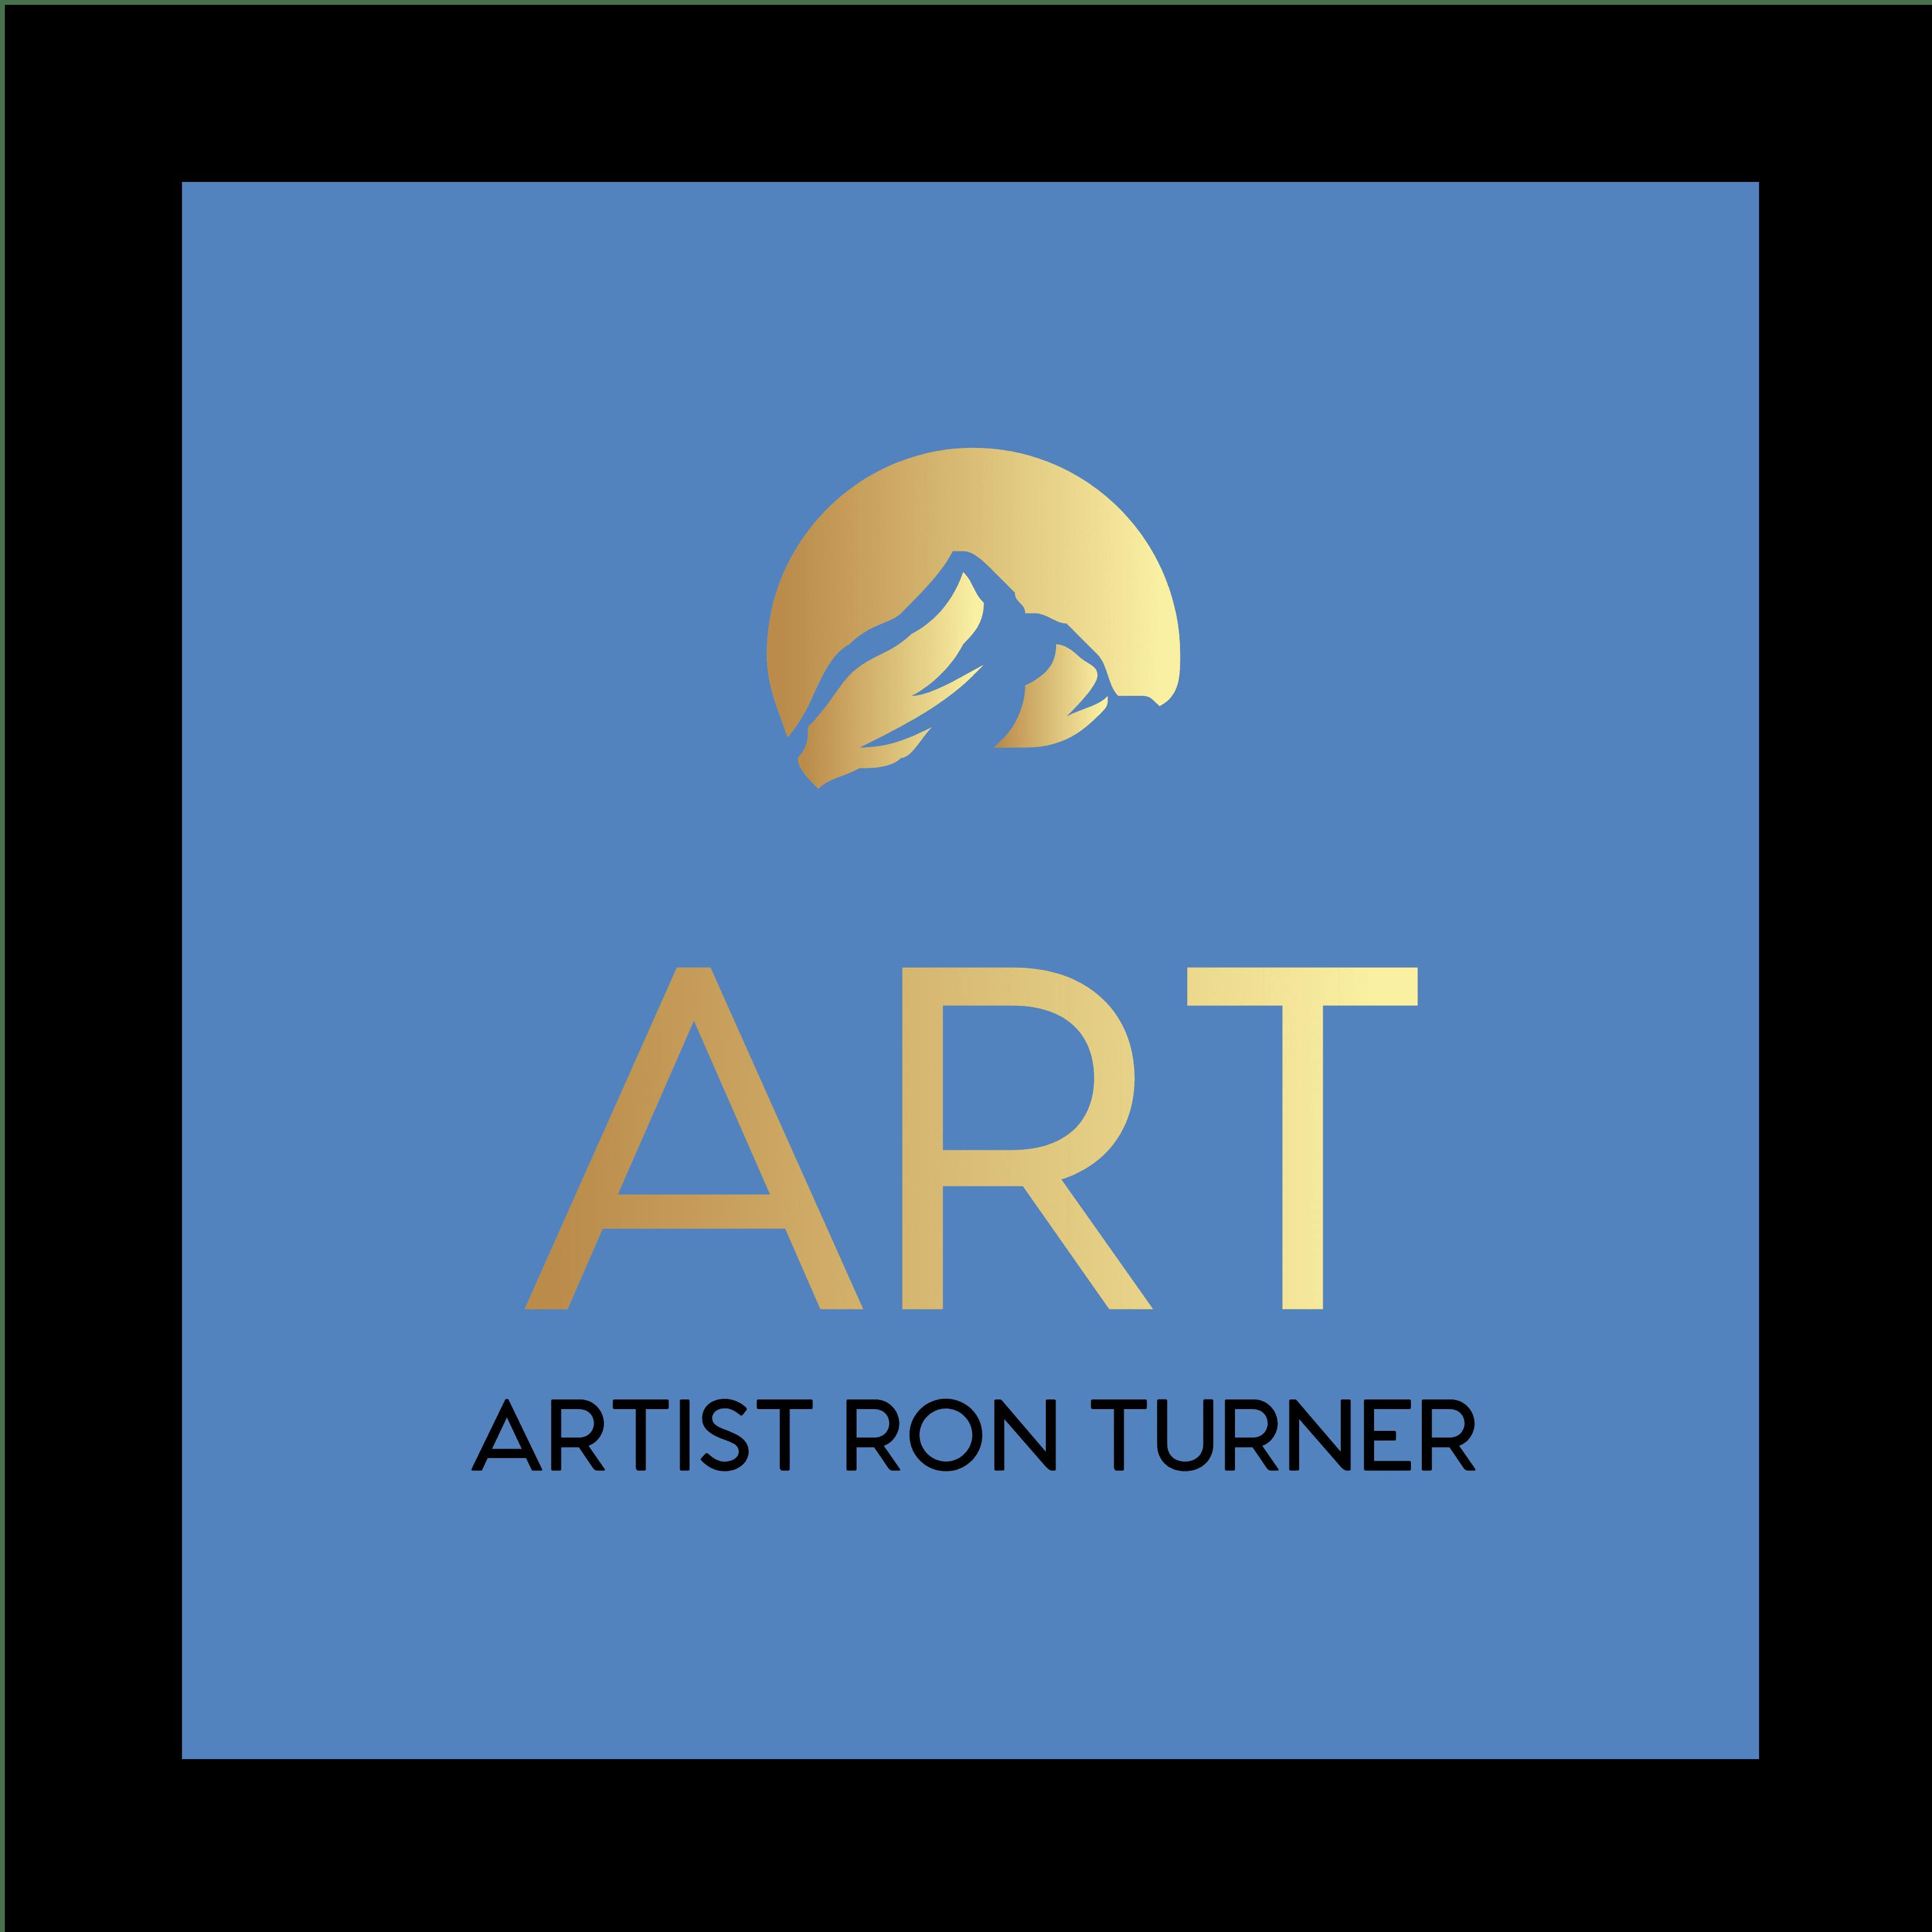 Artist Ron Turner